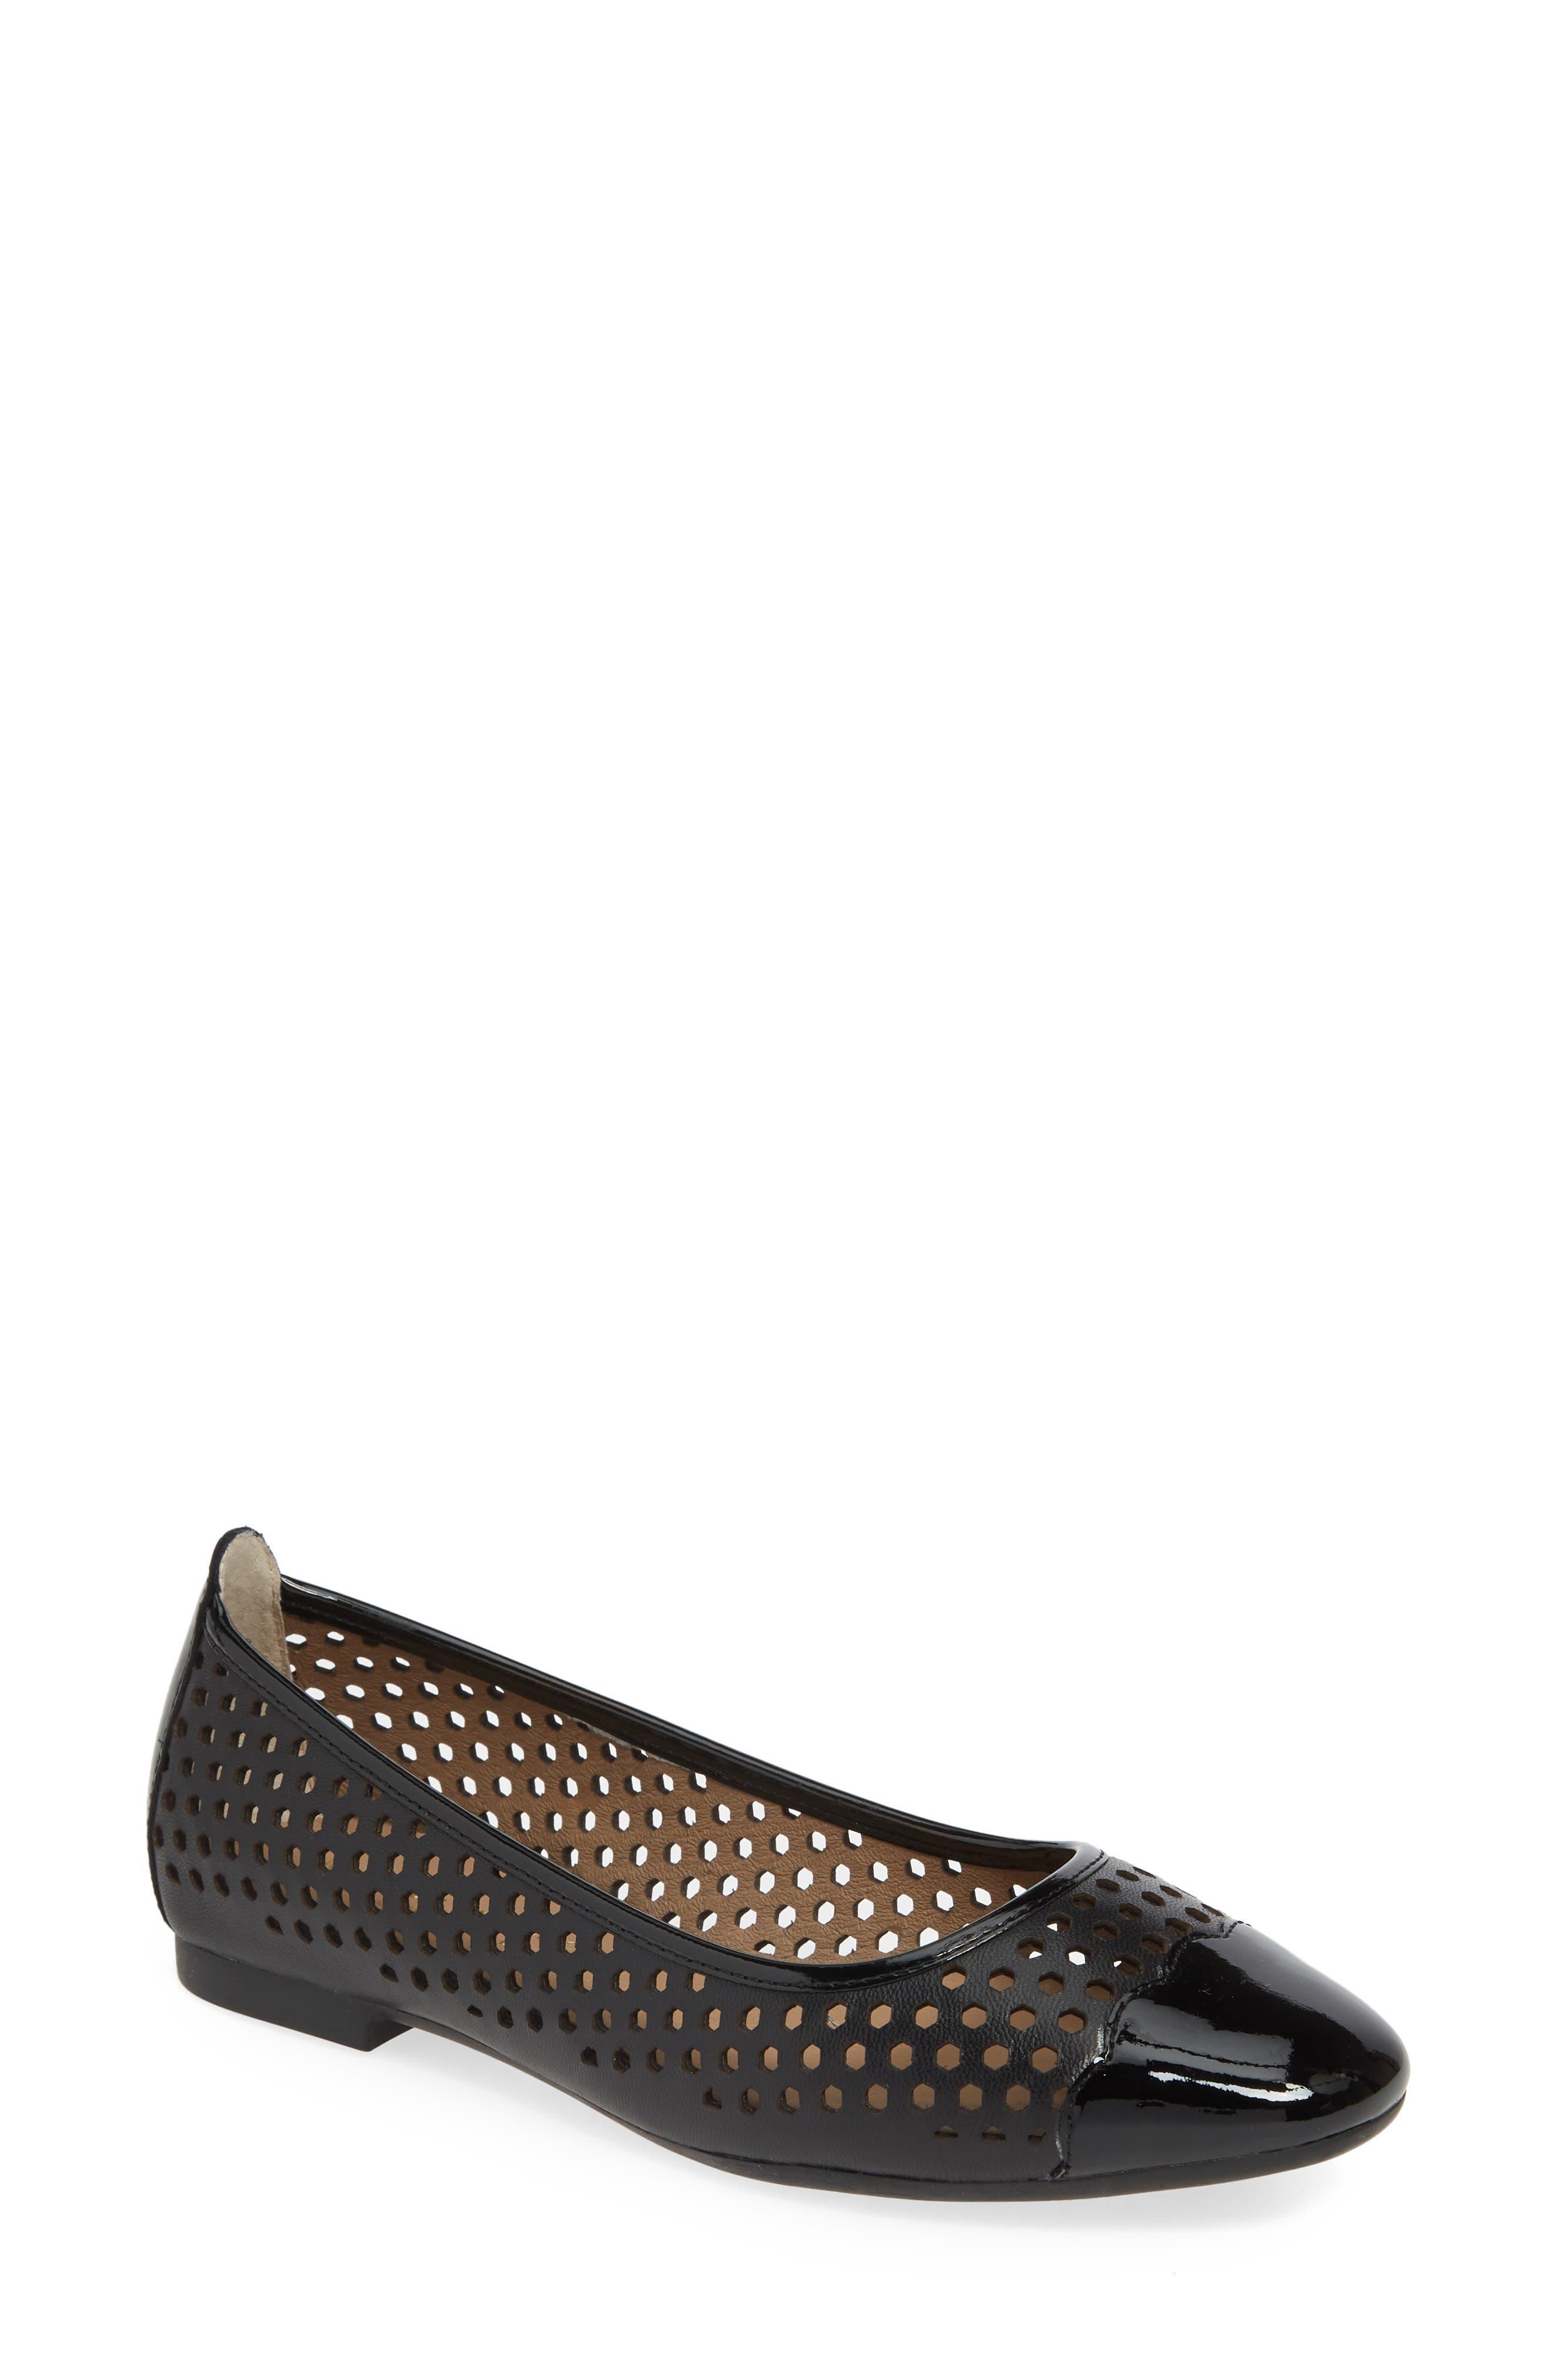 Bettye Mullet Concepts Janae Perforated Cap Toe Flat, Black